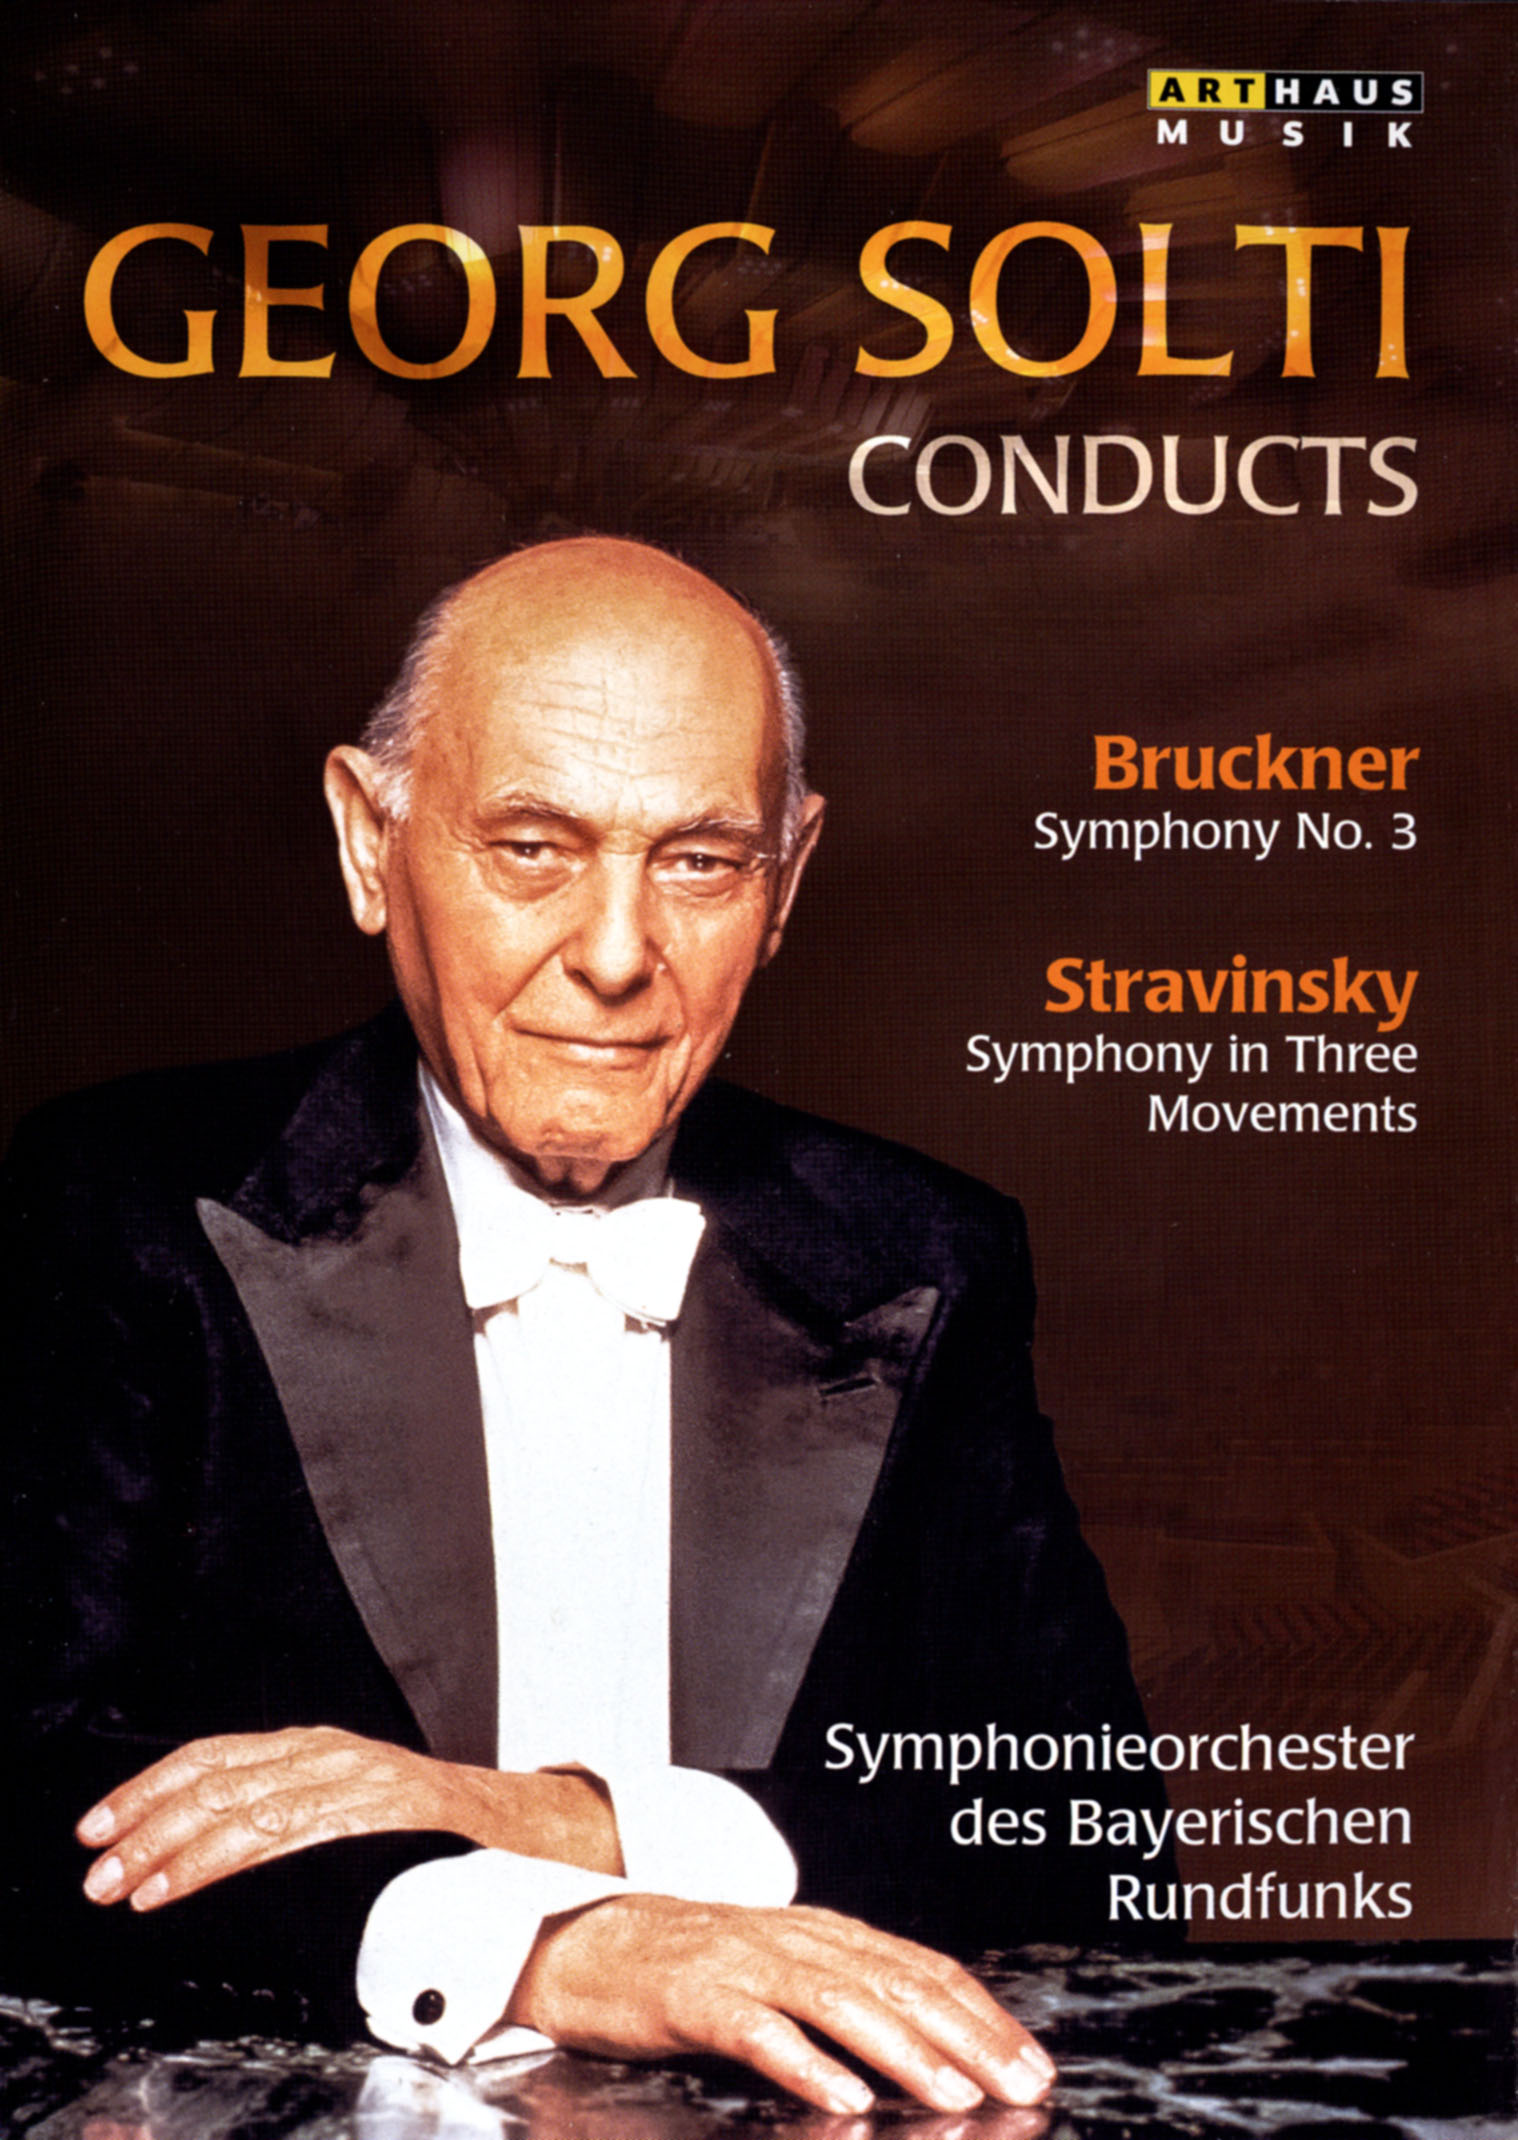 Georg Solti Conducts: Bruckner - Symphony No. 3/Stravinsky - Symphony in Three Movements